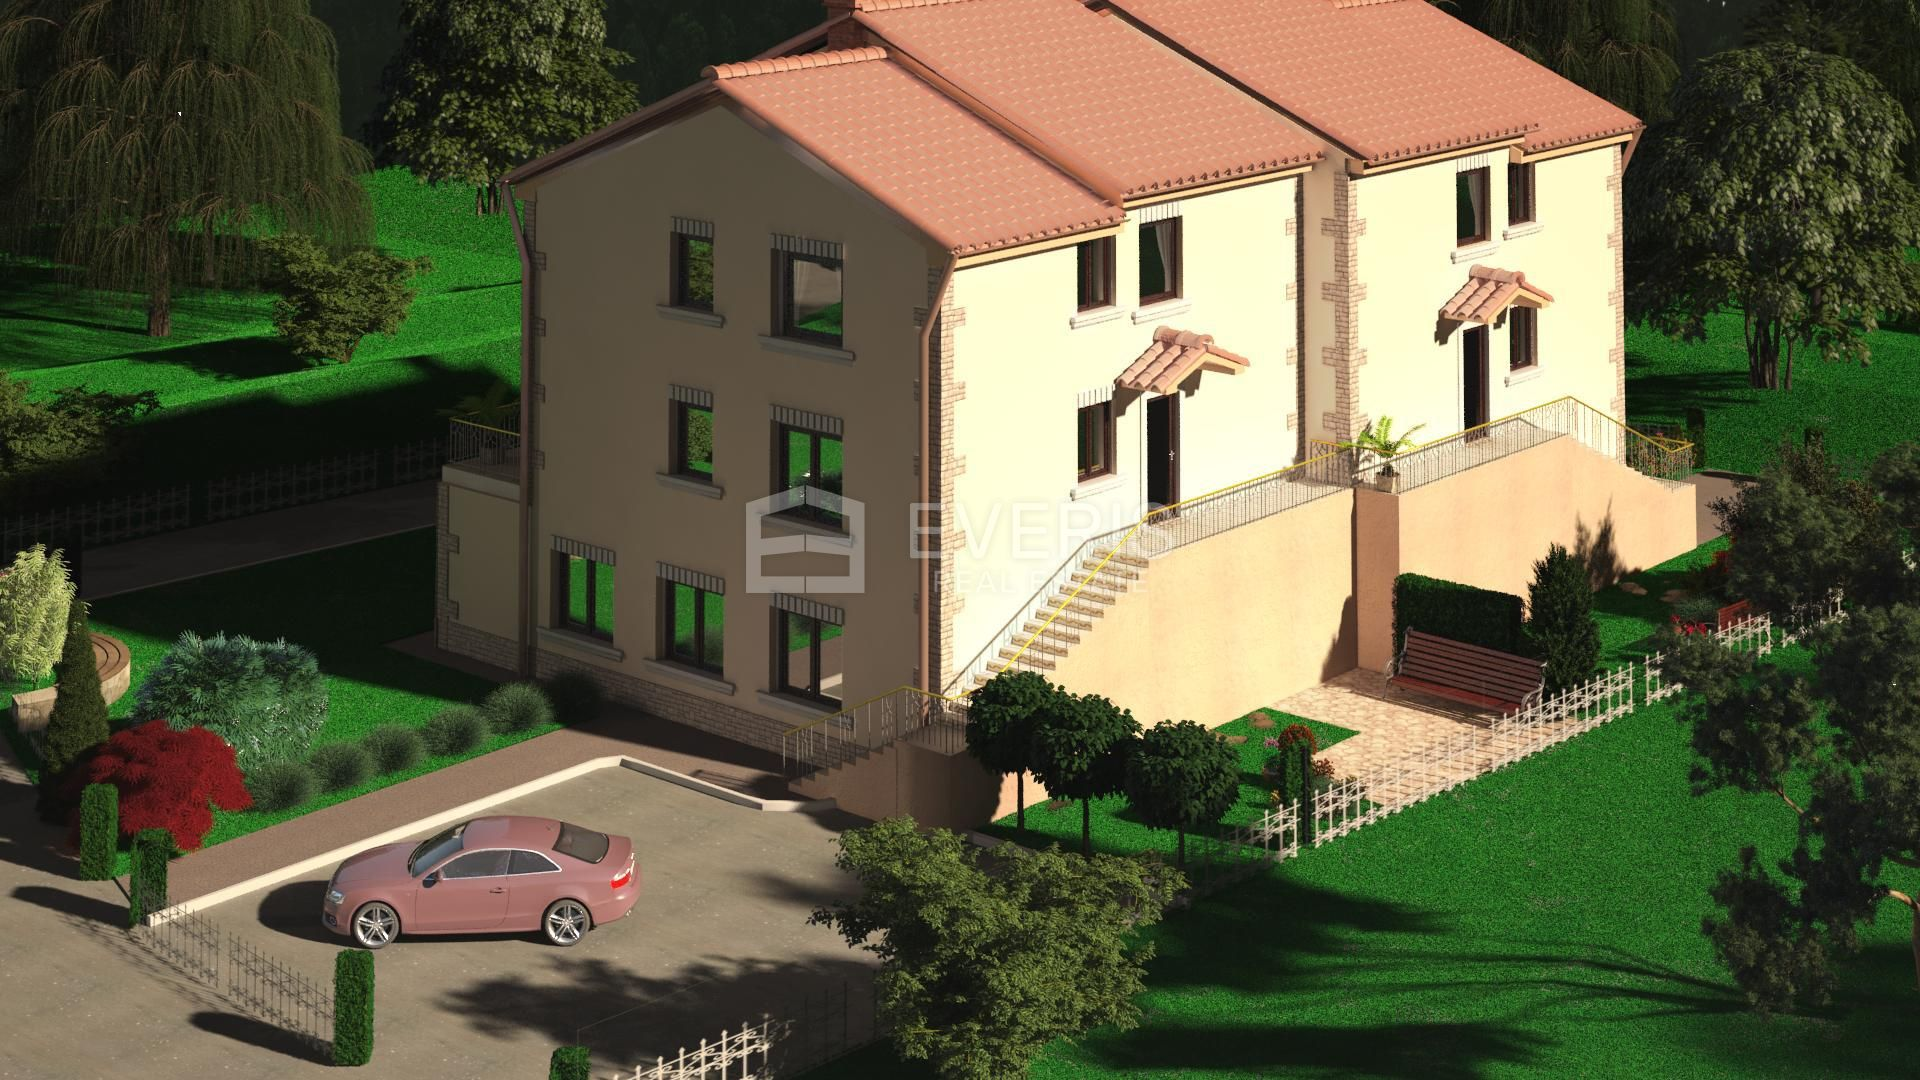 Kastav, Brnčići, građevinsko zemljište, 1.081 m2